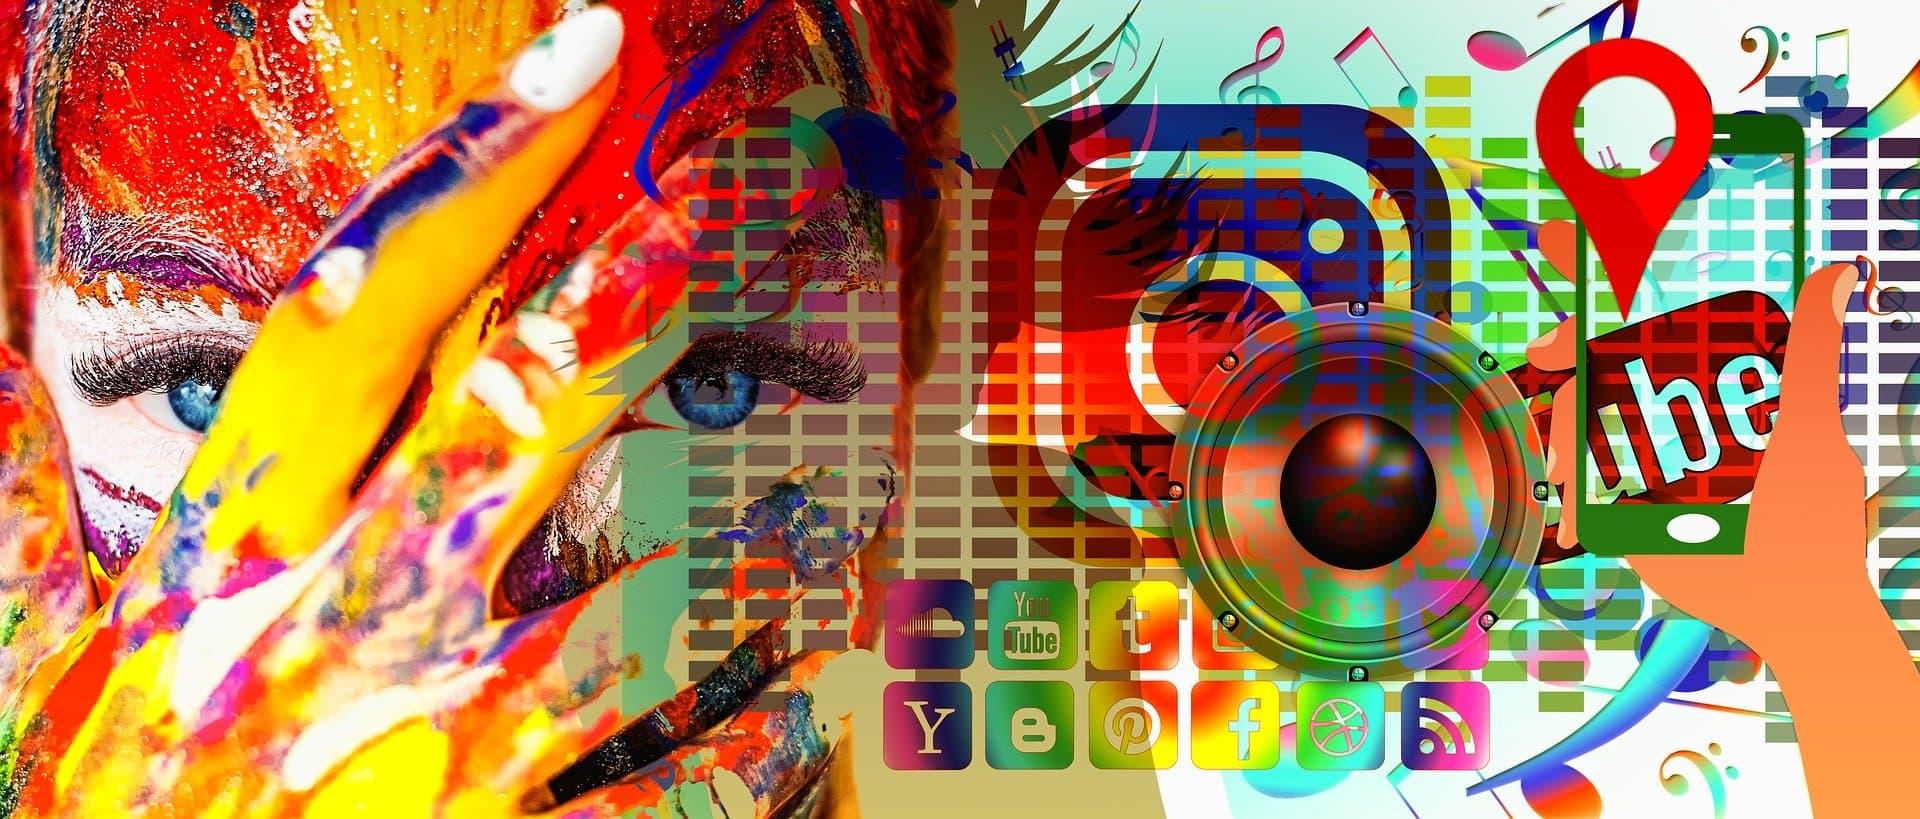 SOCIAL MEDIA HAVE AN IMPACT ON MENTAL HEALTH